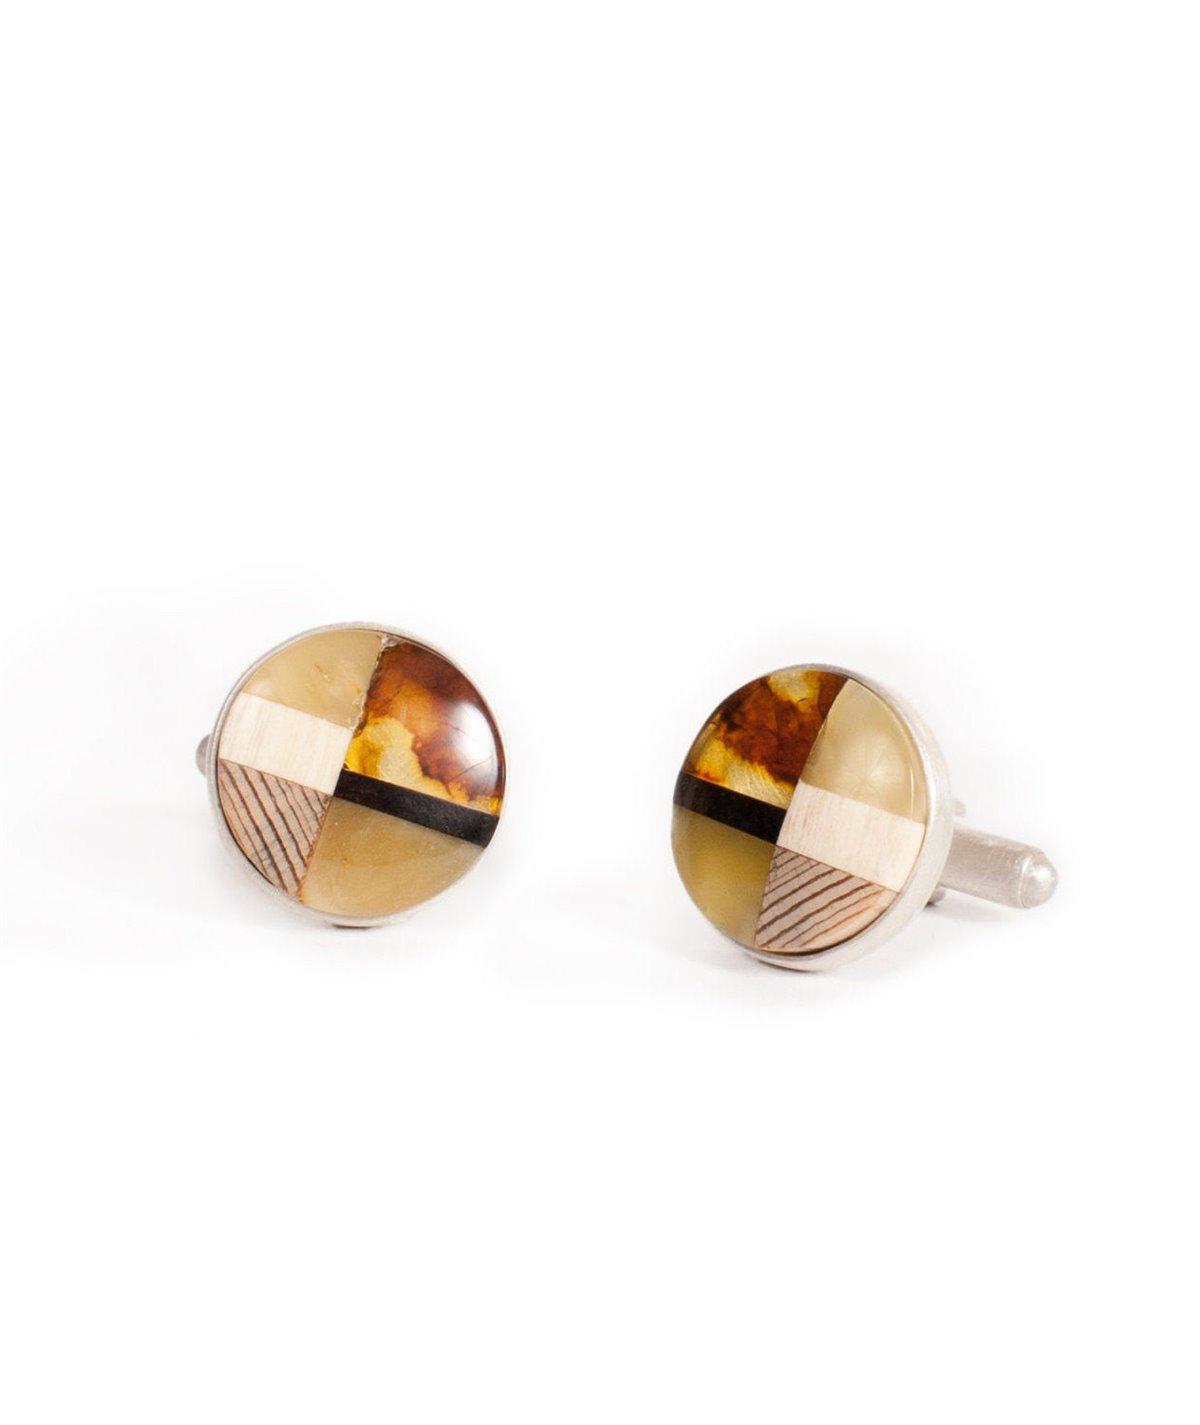 Cufflinks amber and wood